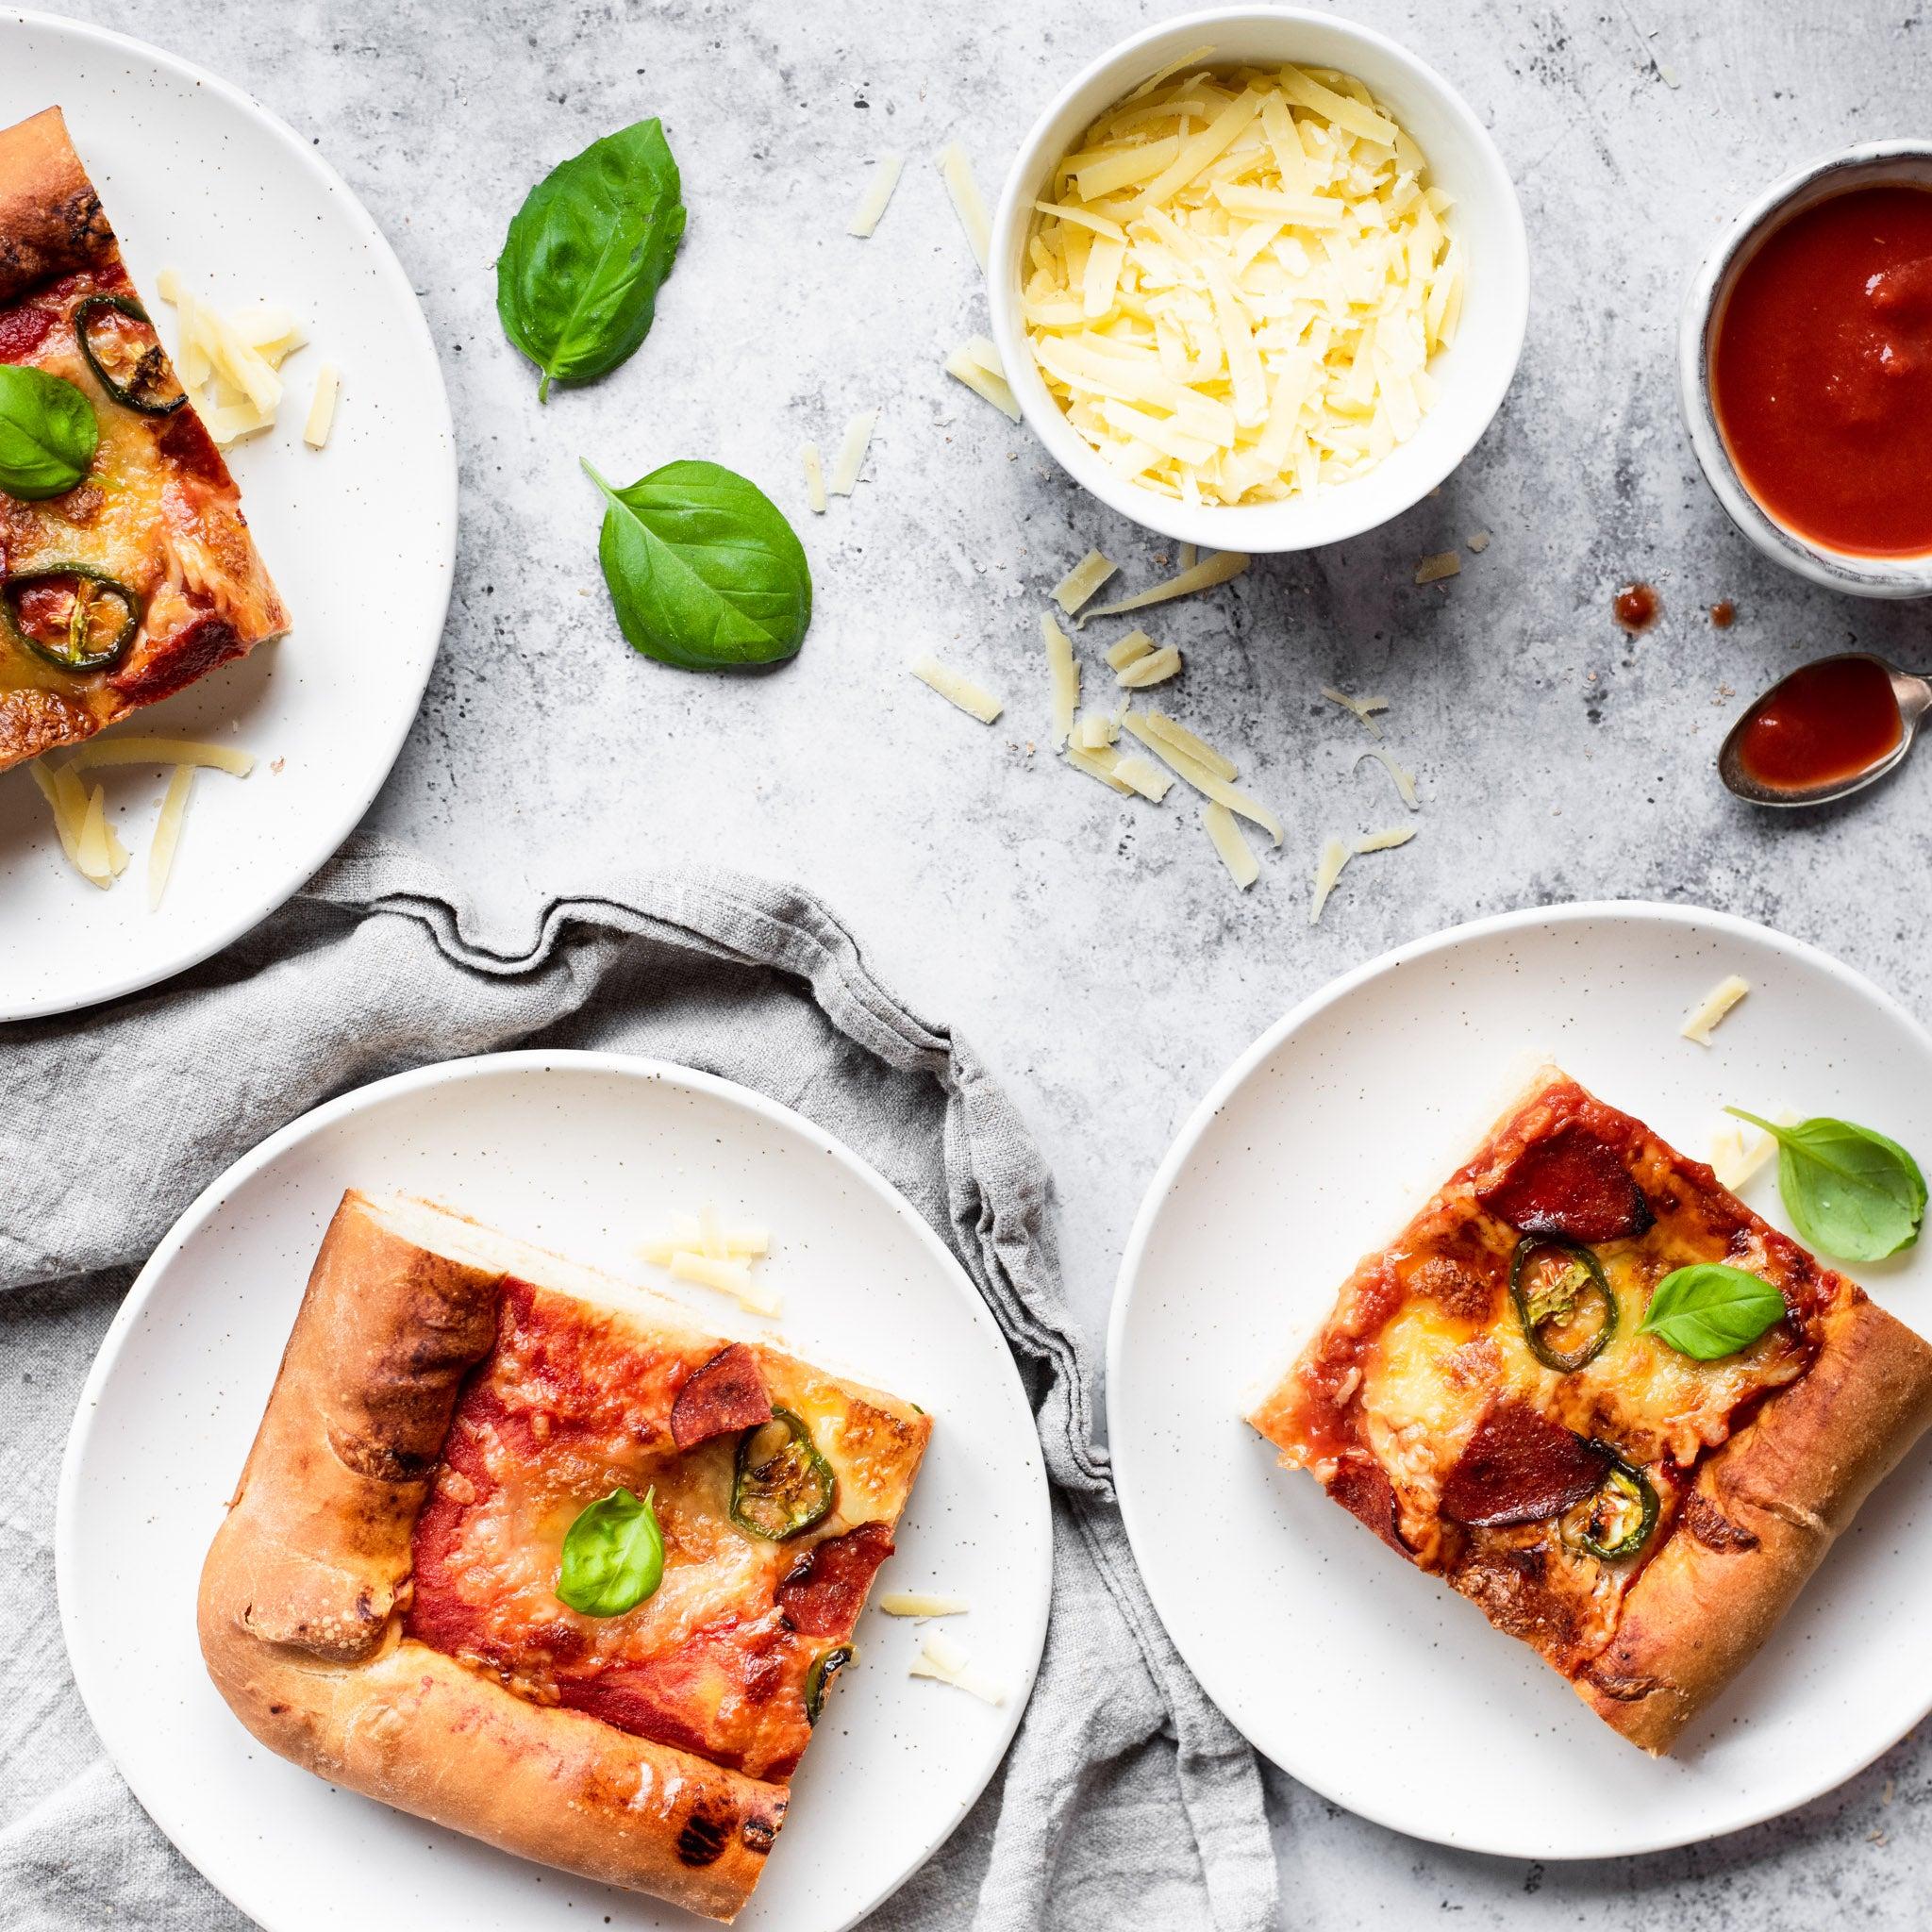 Allinsons-Deep-Pan-Pizza-1-1-Baking-Mad-9.jpg